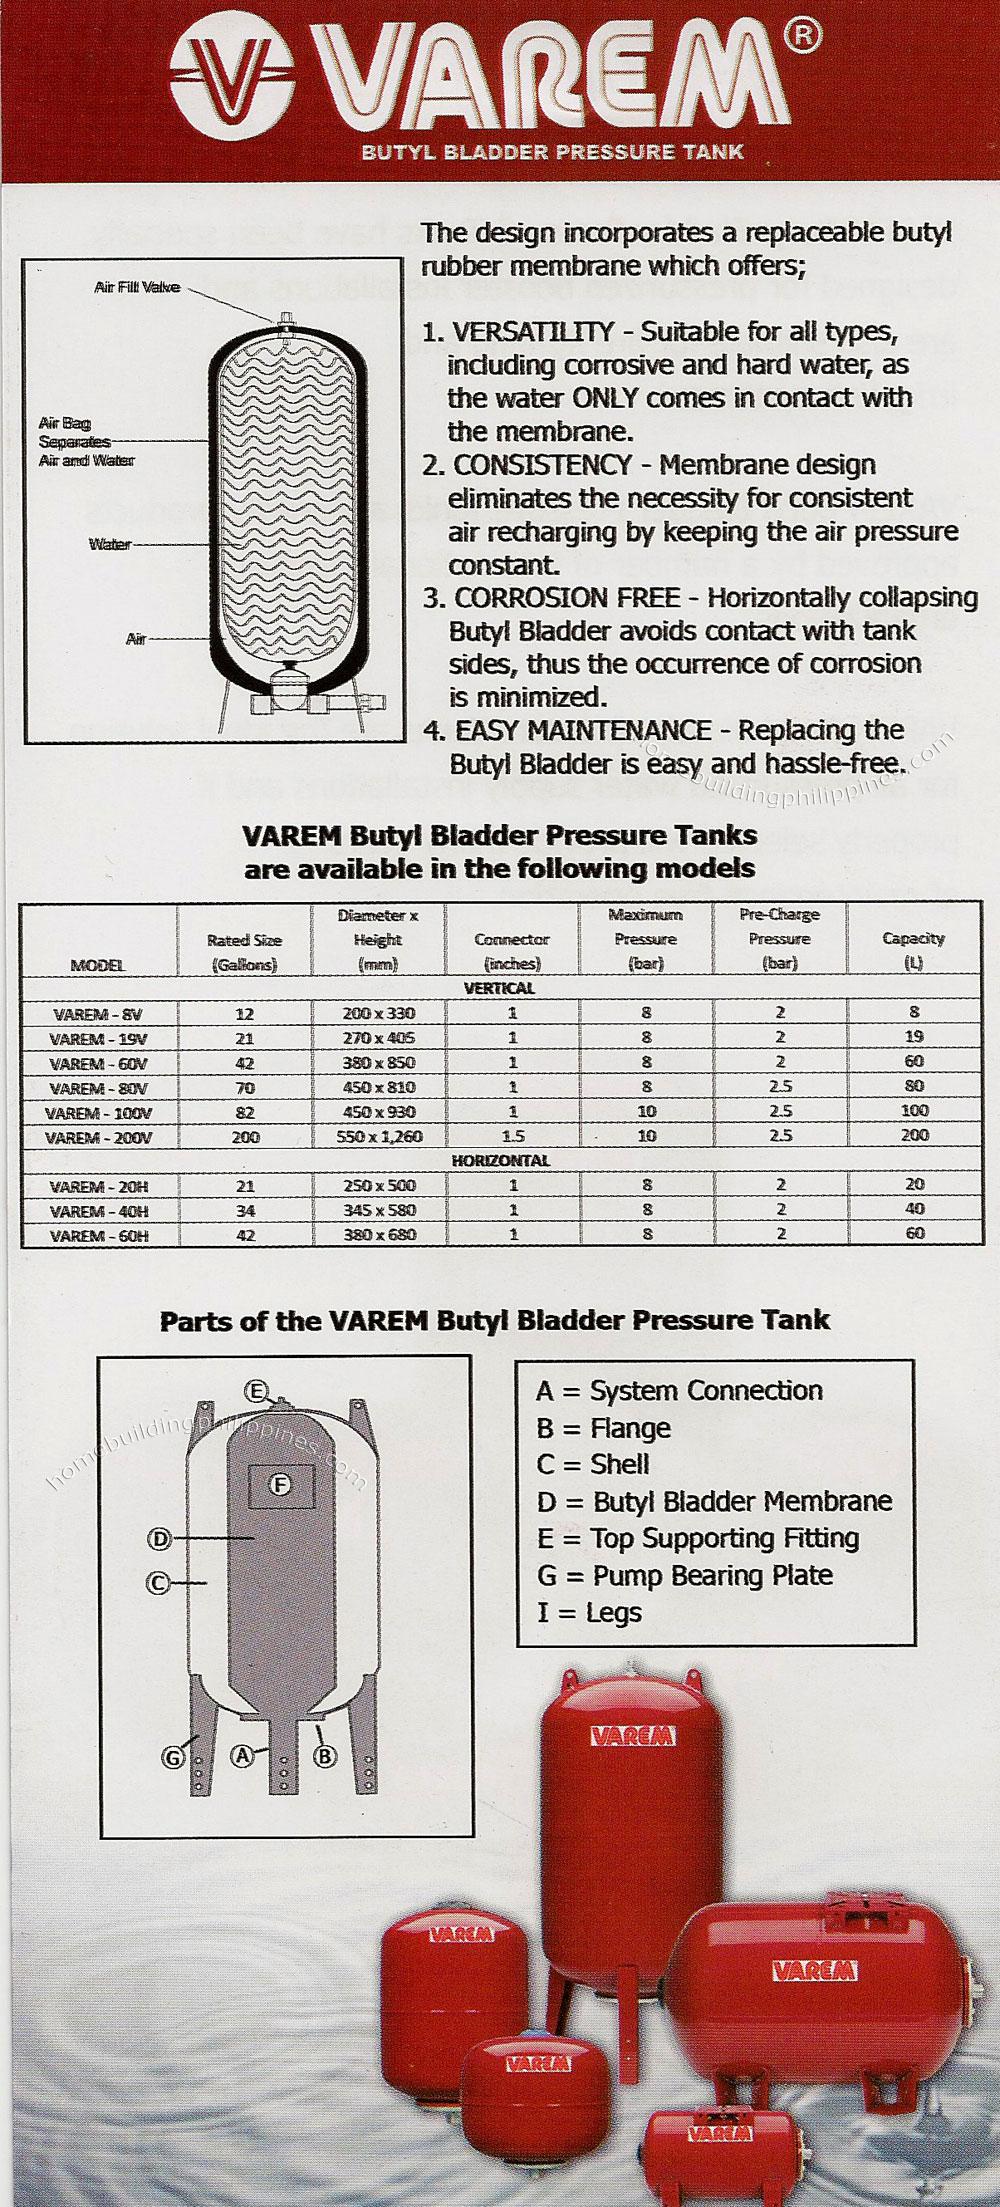 Varem Butyl Bladder Pressure Tank